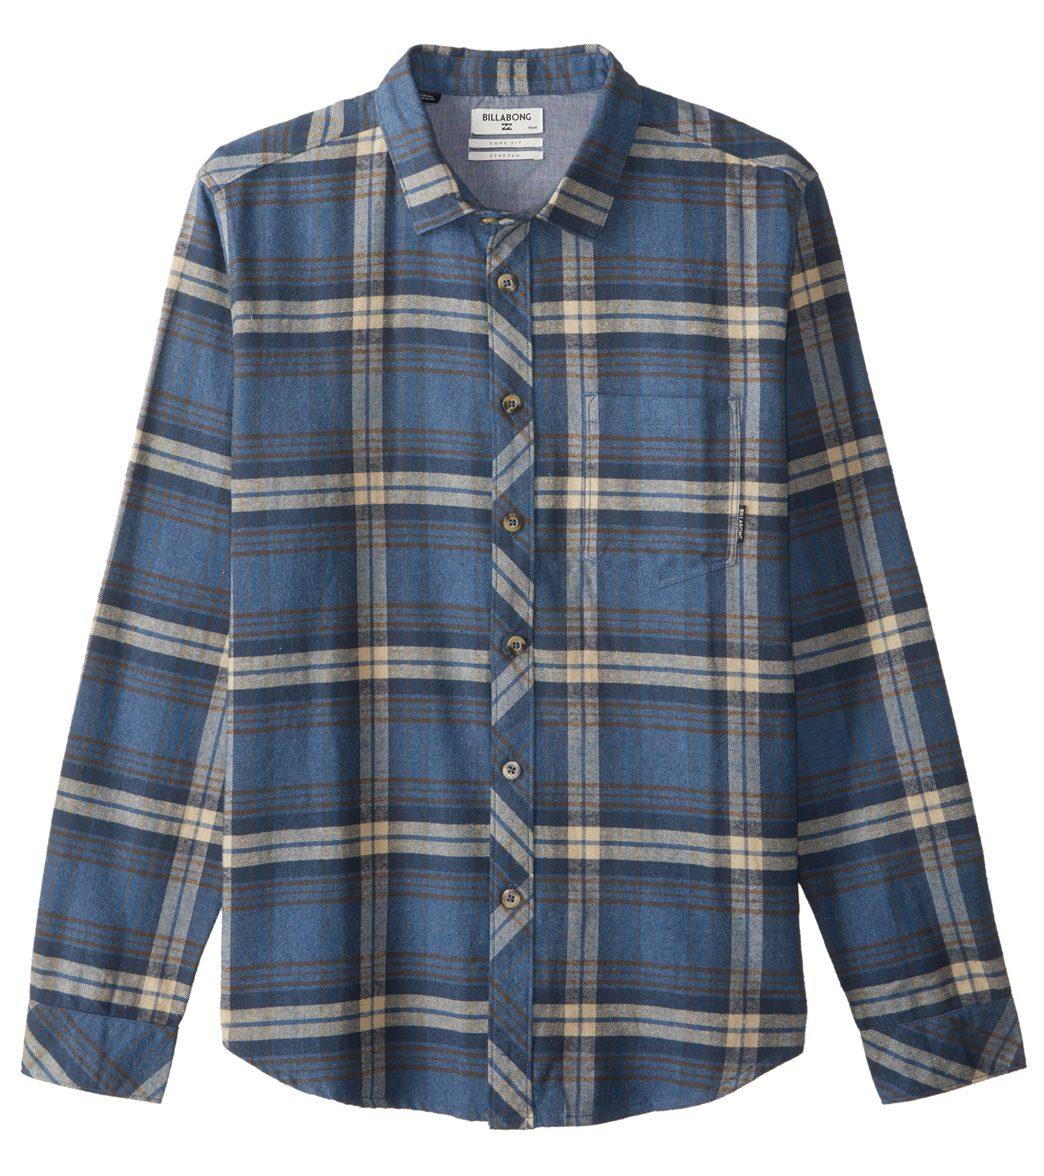 Billabong Mens Coastline Long Sleeve Flannel Shirt Blue Medium